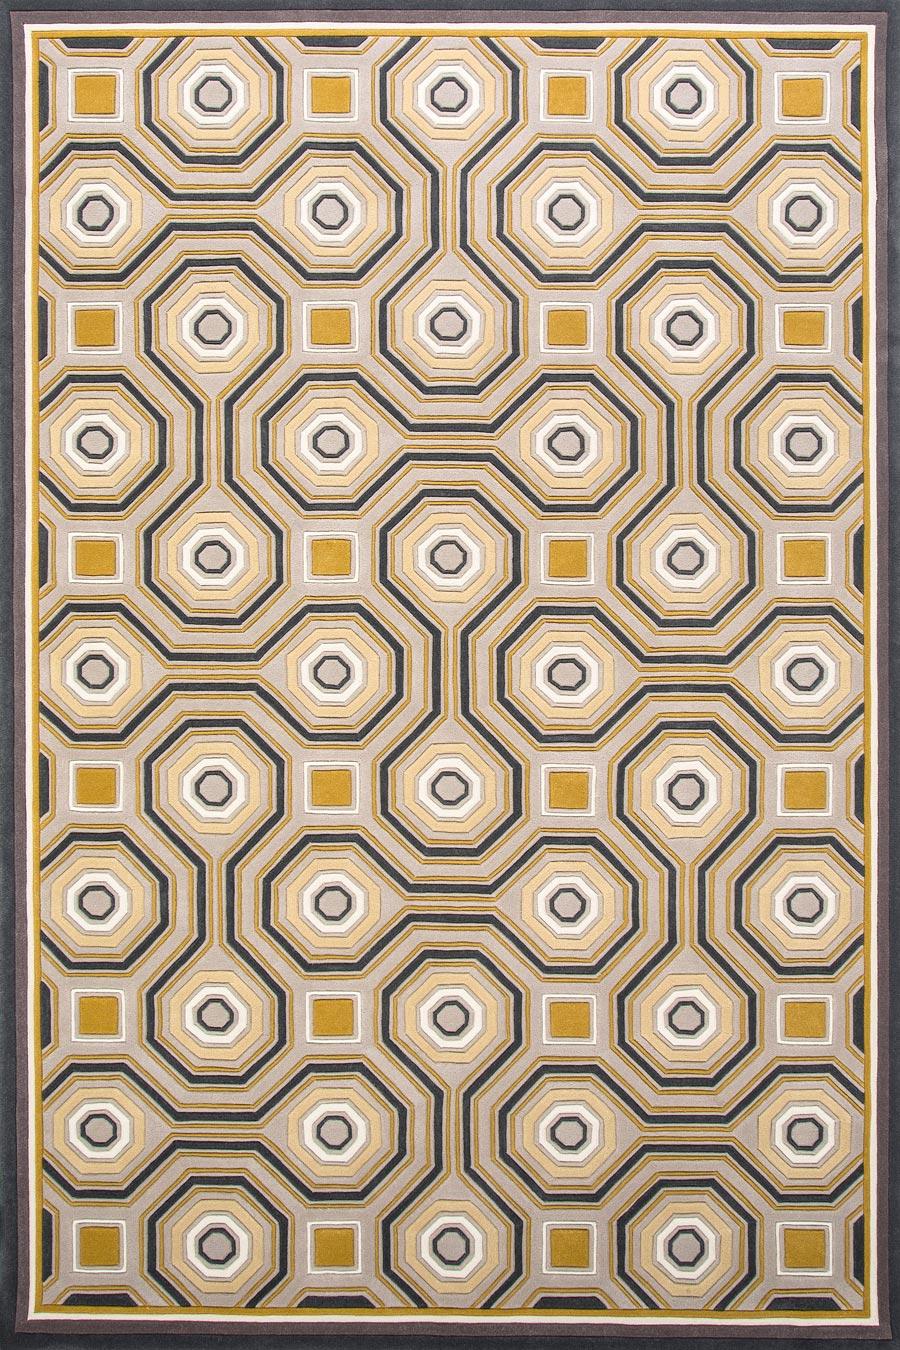 overhead of knightsbridge rug by greg natale